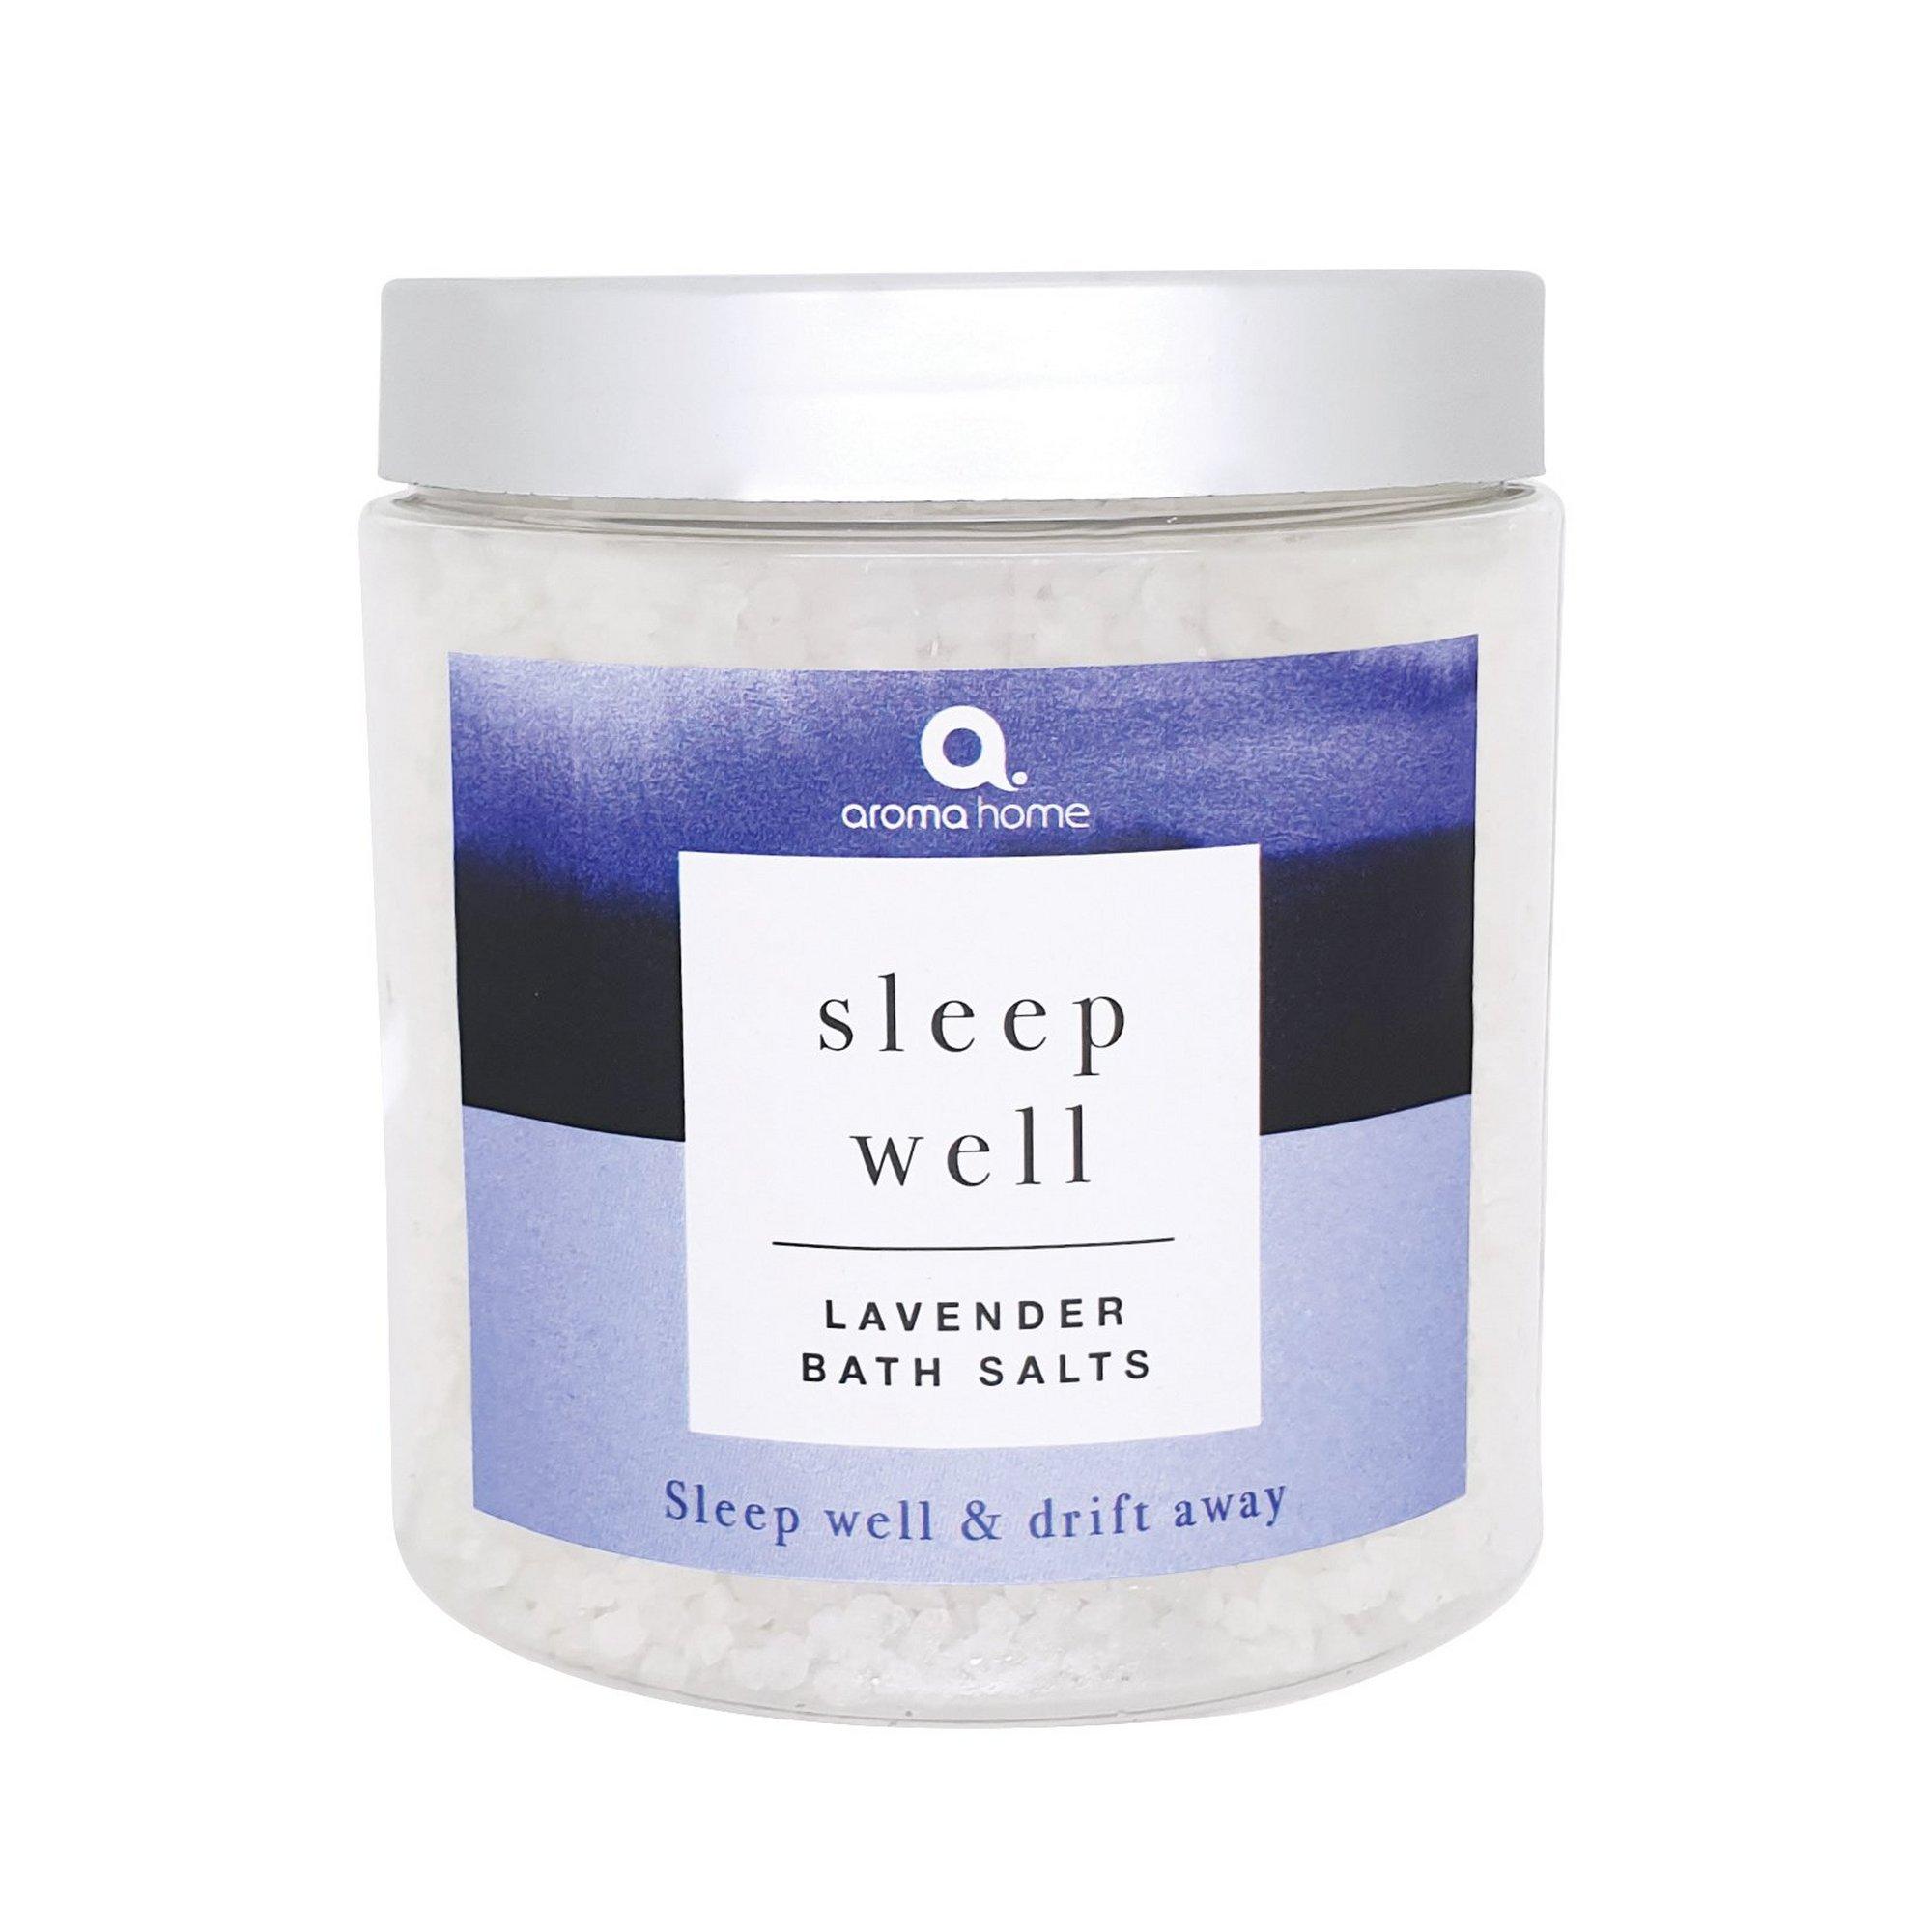 Image of Aroma Home Sleep Well Lavender Bath Salts